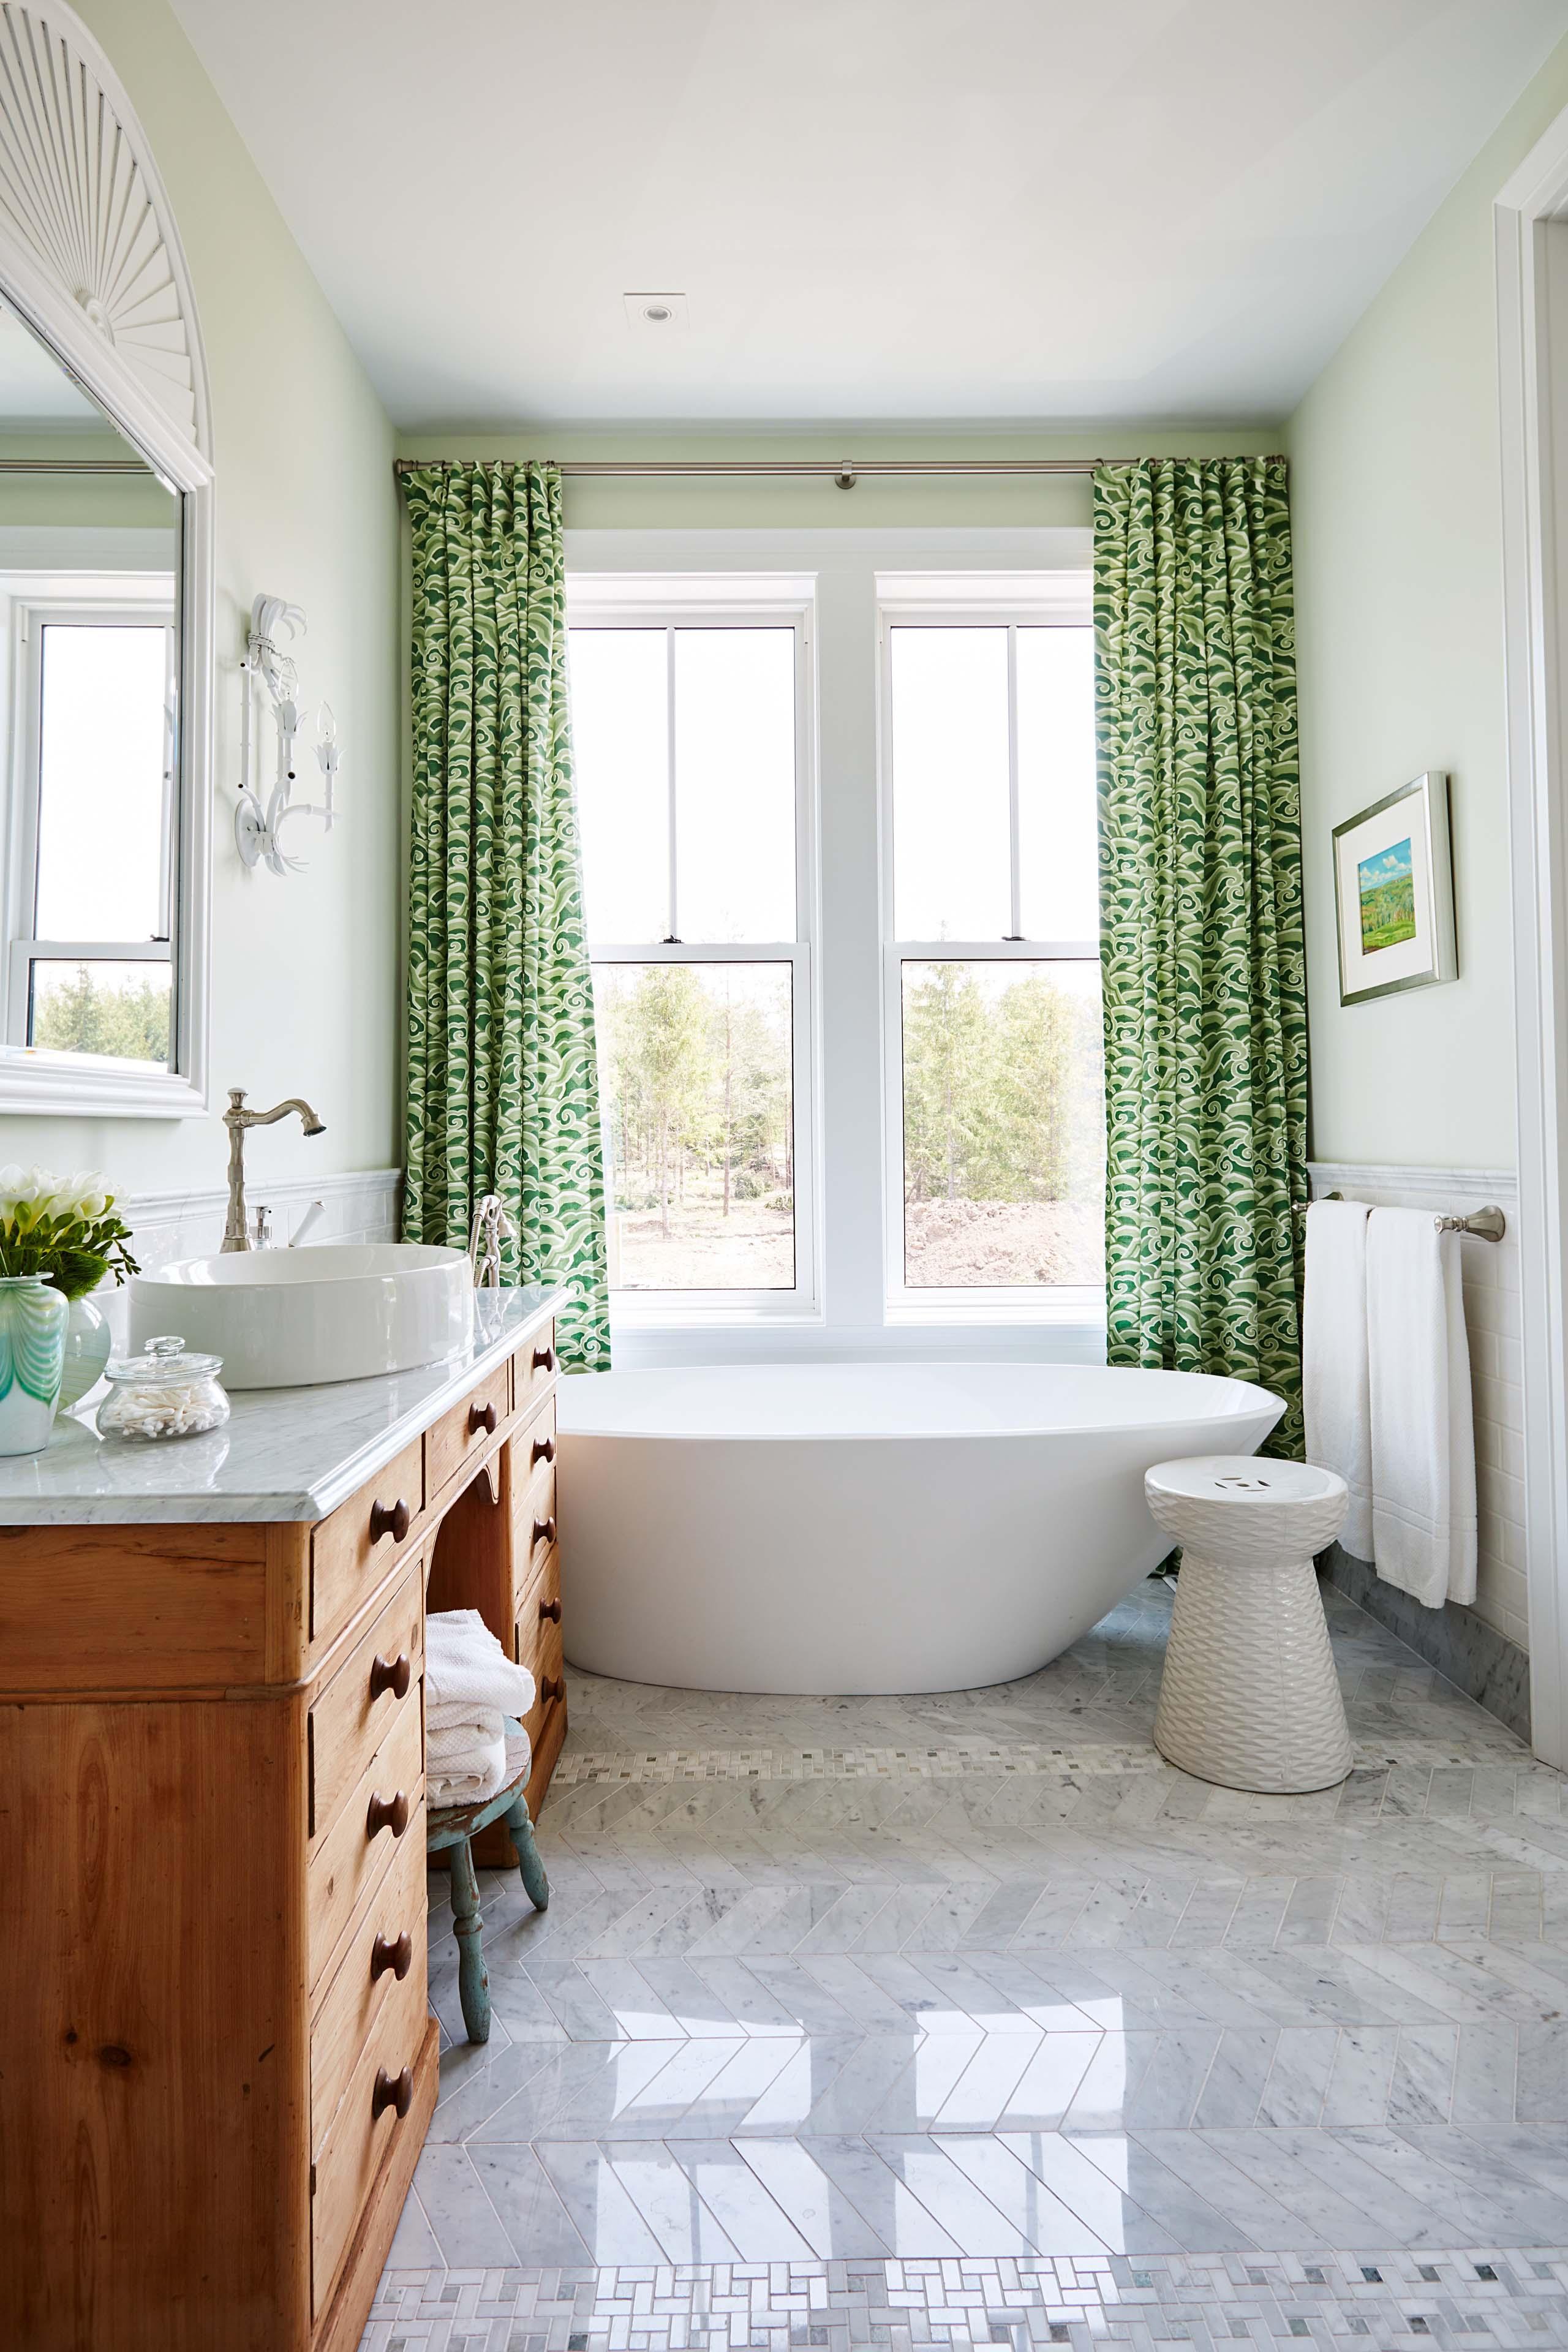 Green and white bathroom with classic design by #SarahRichardson #greenandwhite #marbleherringbone